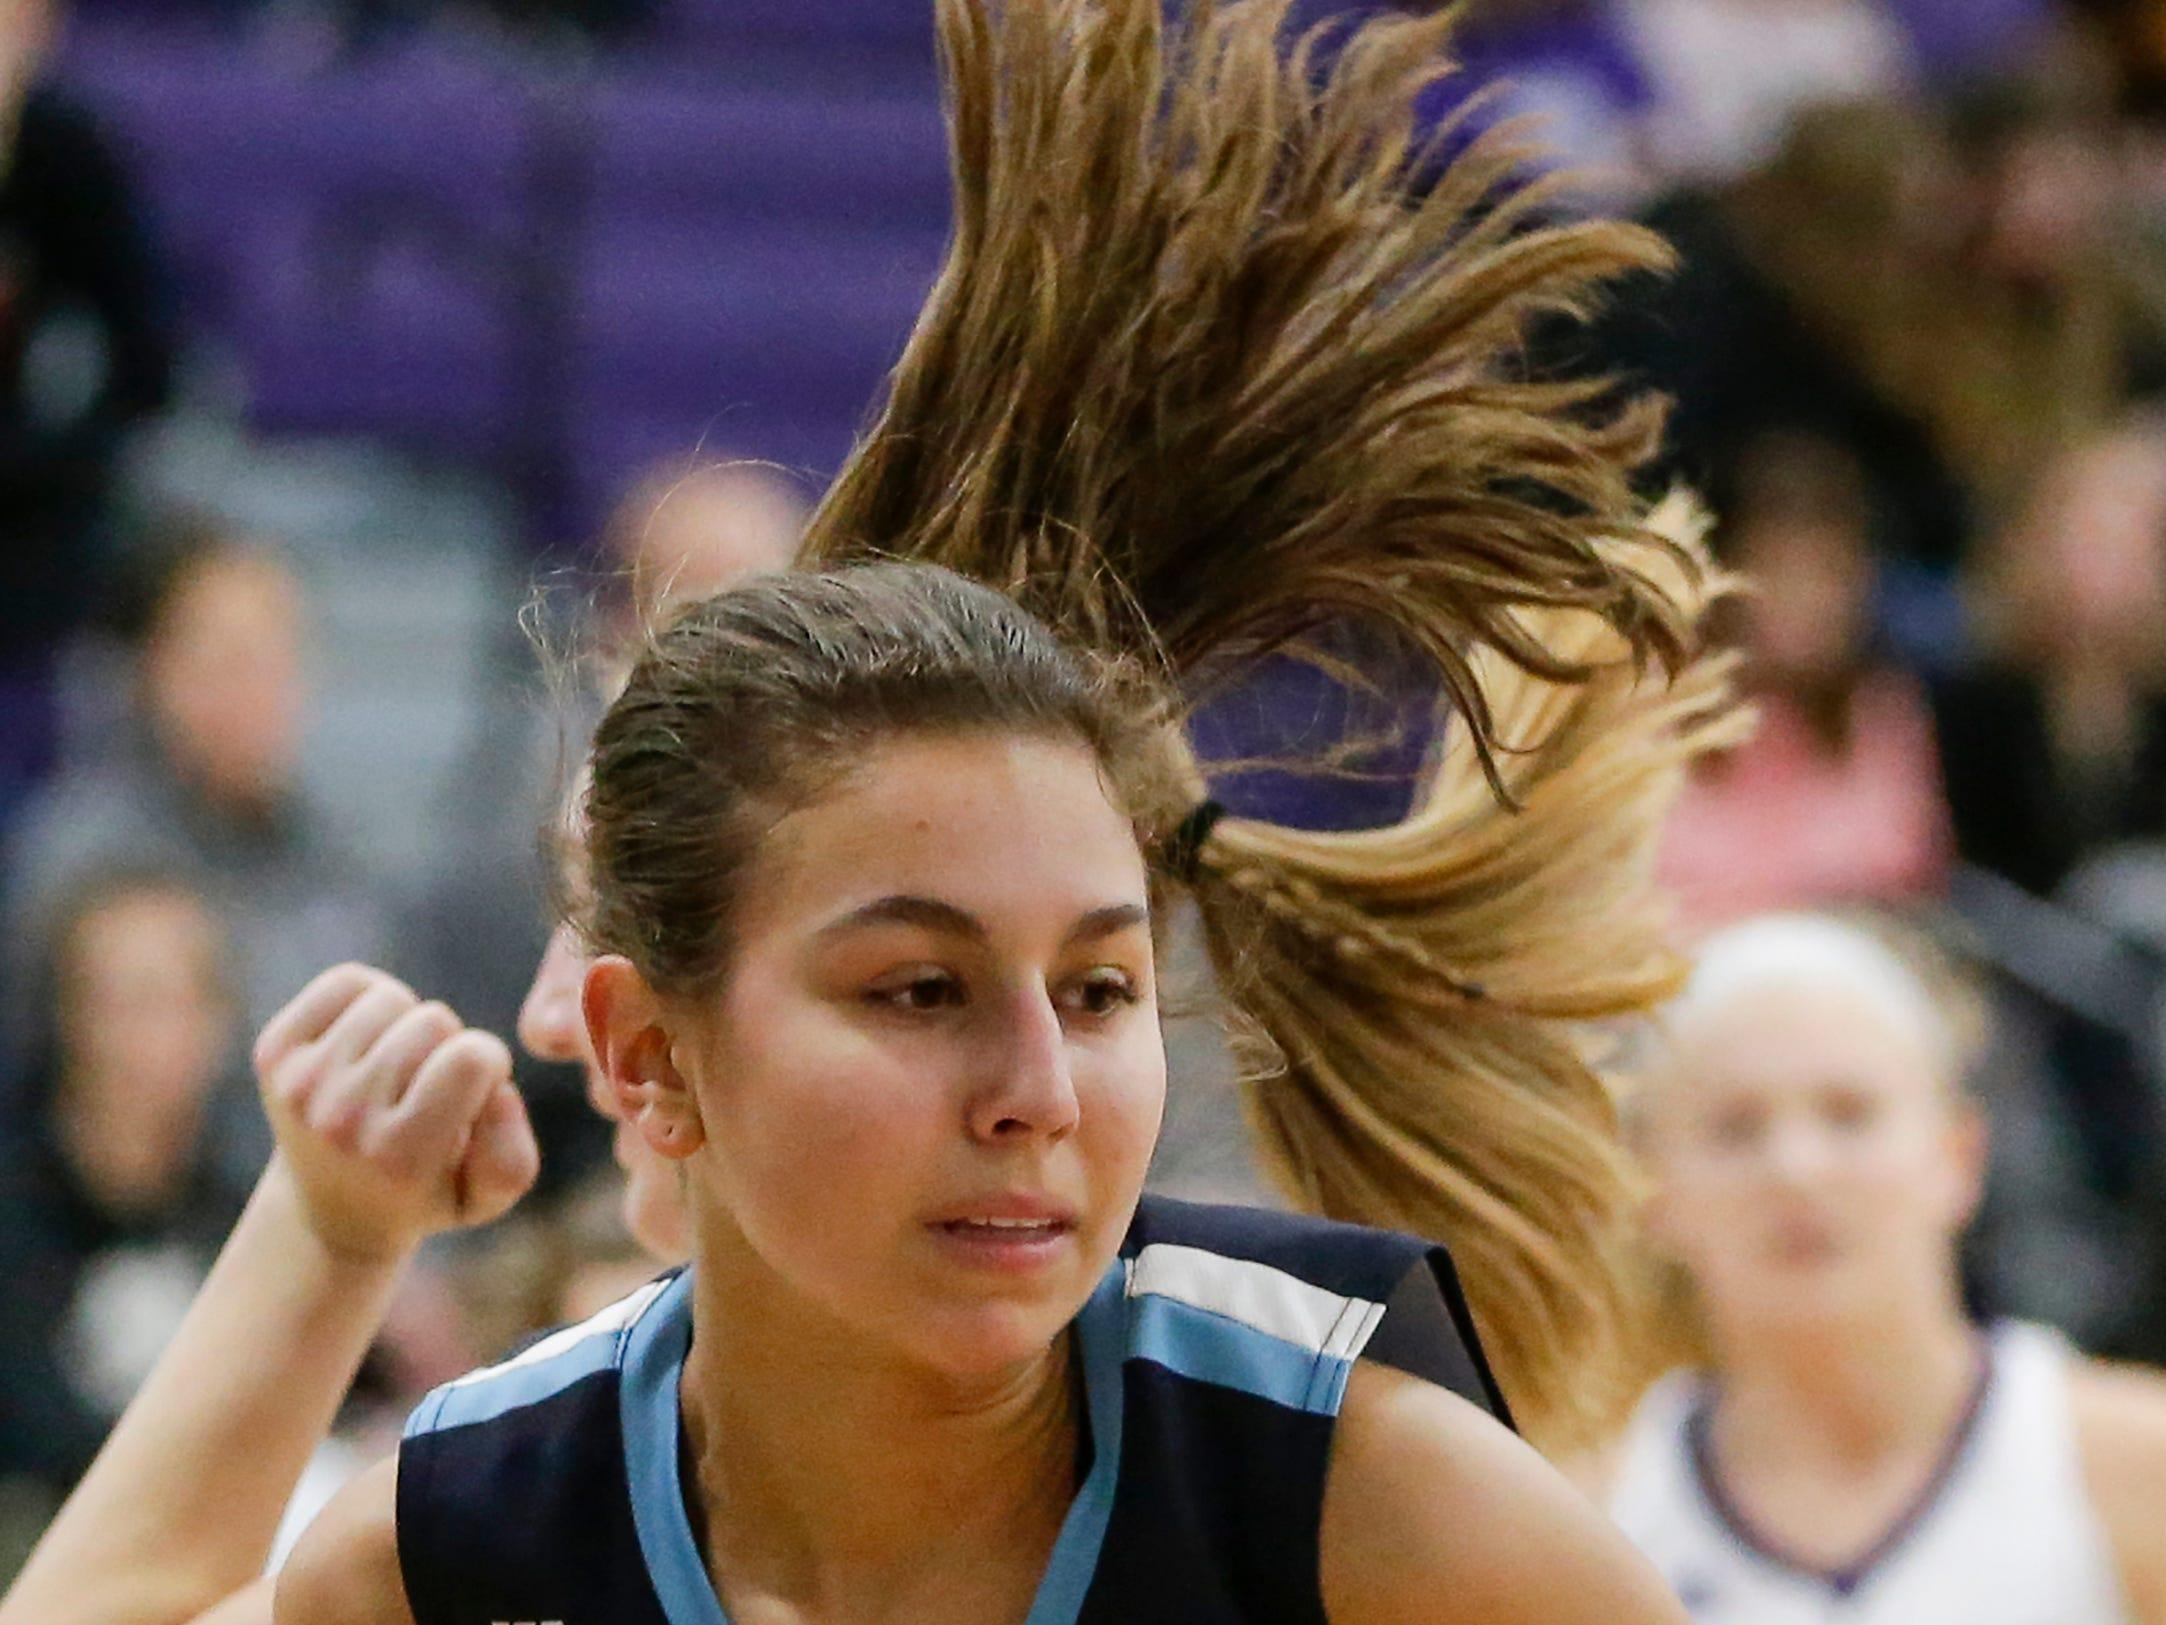 Roncalli's Megan Moczynski (12) rebounds against Kiel during an EWC matchup at Kiel High School Thursday, January 17, 2019, in Kiel, Wis. Joshua Clark/USA TODAY NETWORK-Wisconsin